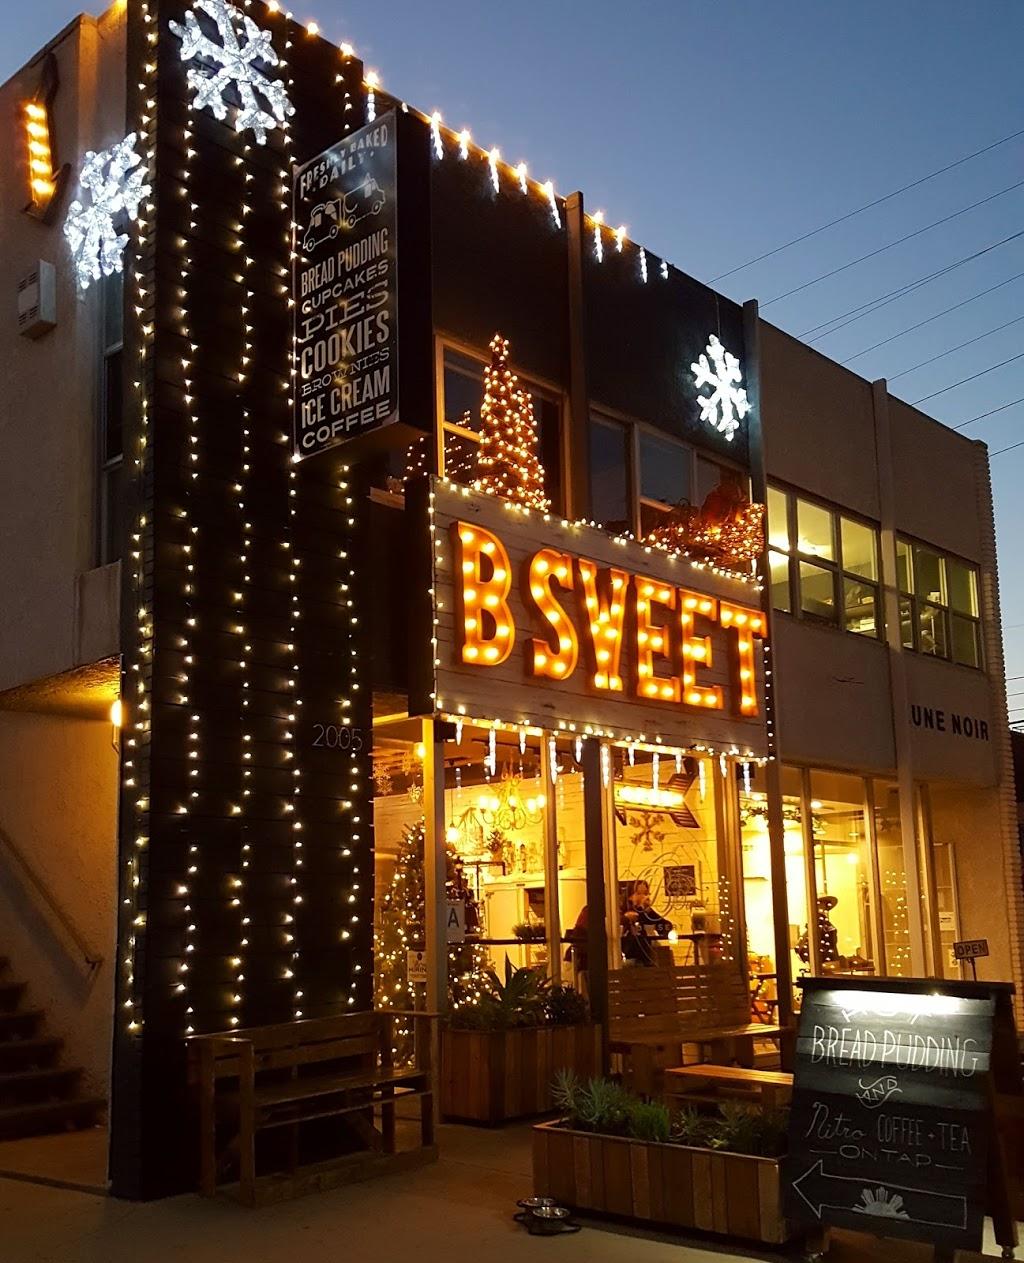 B Sweet Dessert Bar - bakery  | Photo 5 of 10 | Address: 2005 Sawtelle Blvd, Los Angeles, CA 90025, USA | Phone: (310) 963-9769